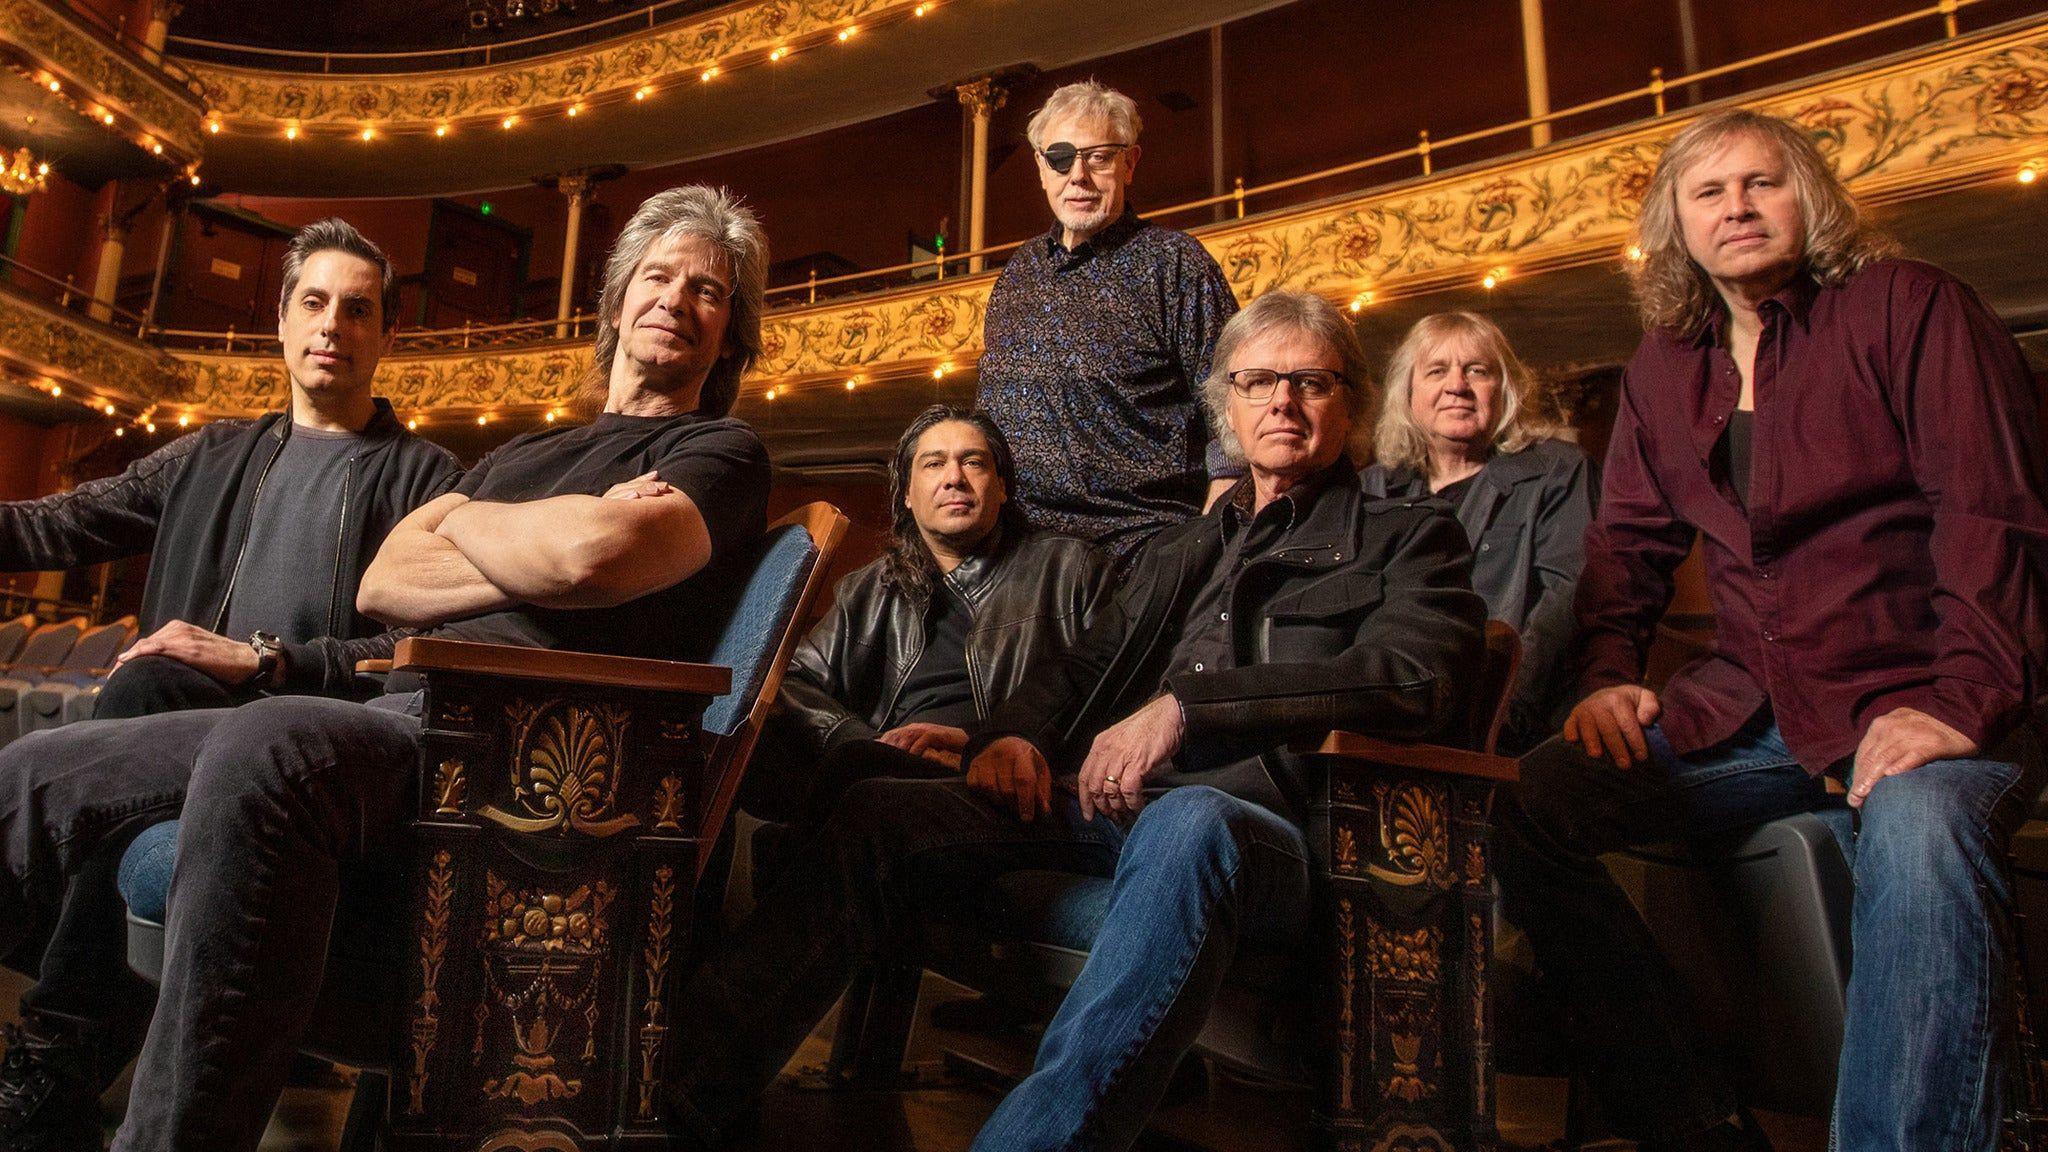 Kansas - Point Of Know Return Anniversary tour 2022